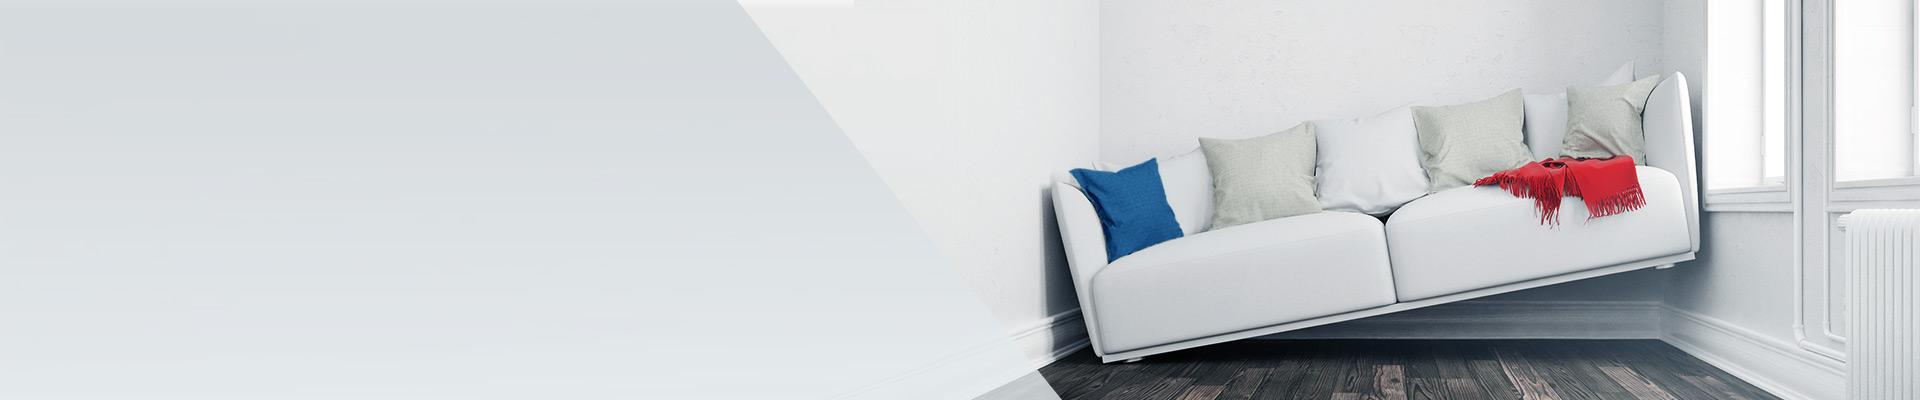 weißes Sofa schief